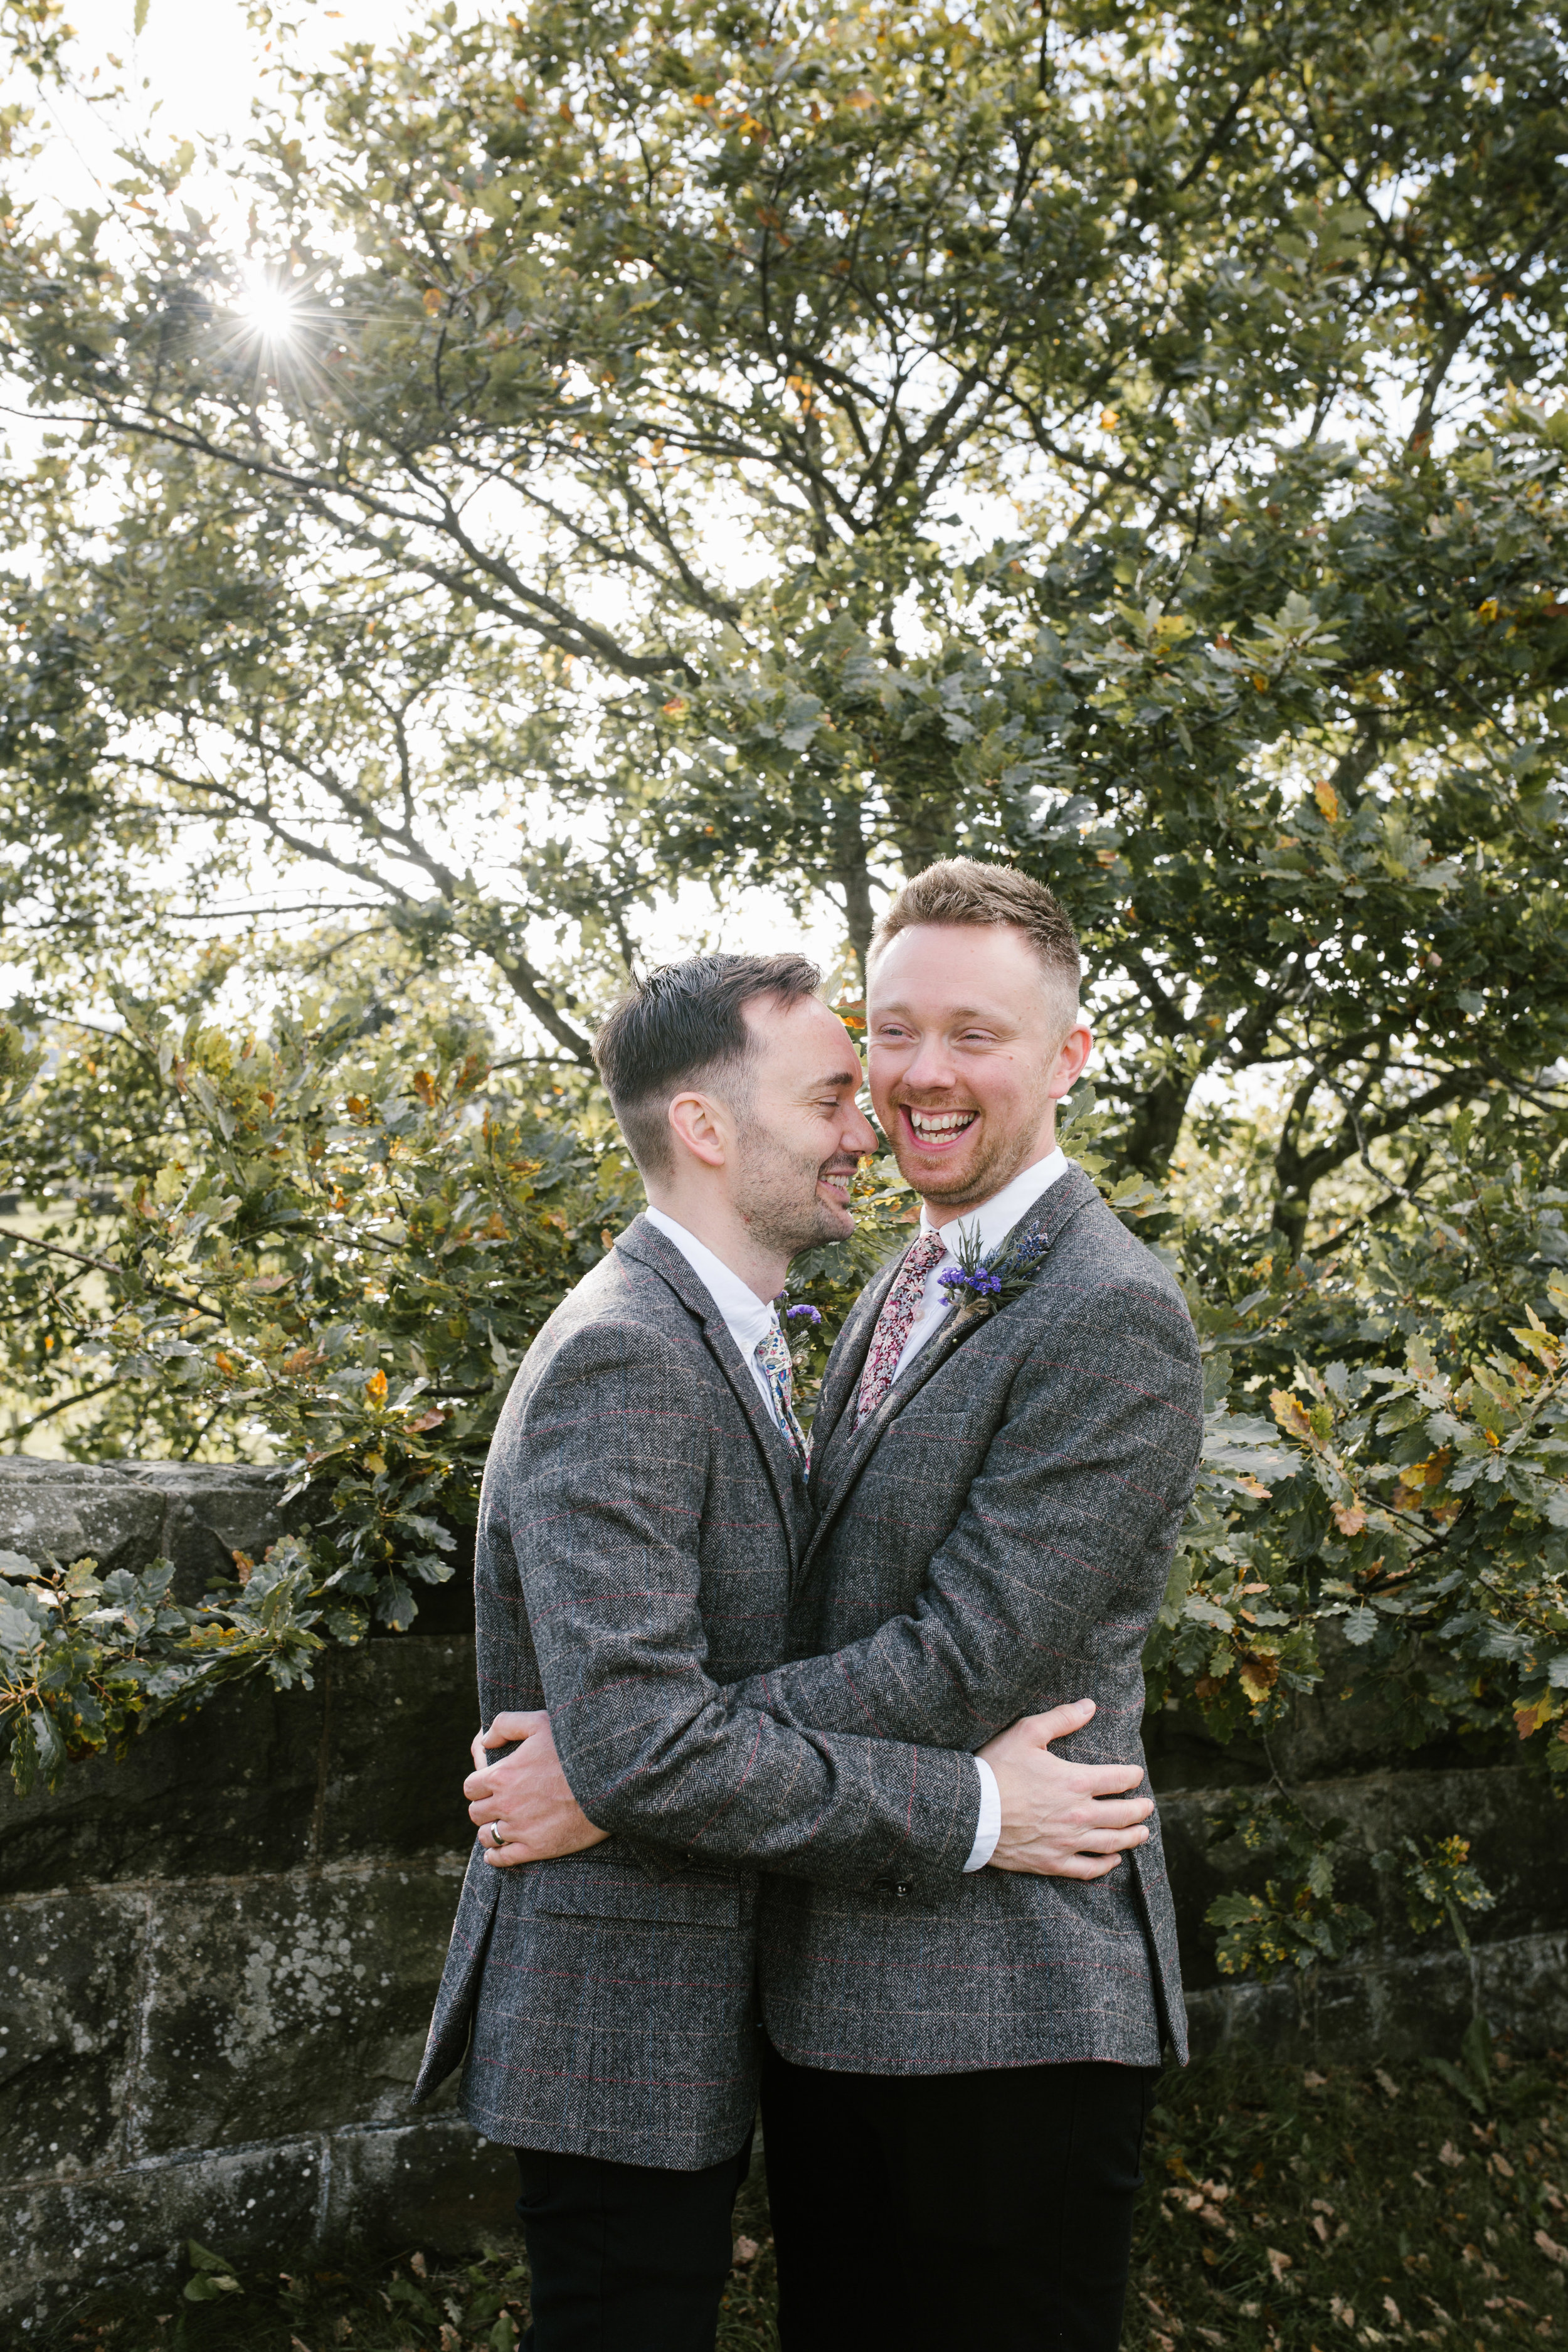 Tower Hill Barns, Tower Hill Barns wedding, Tower Hill Barns wedding photographer, staffordshire wedding photographer, barn wedding, diy weding, same sex wedding, gay wedding-240.jpg